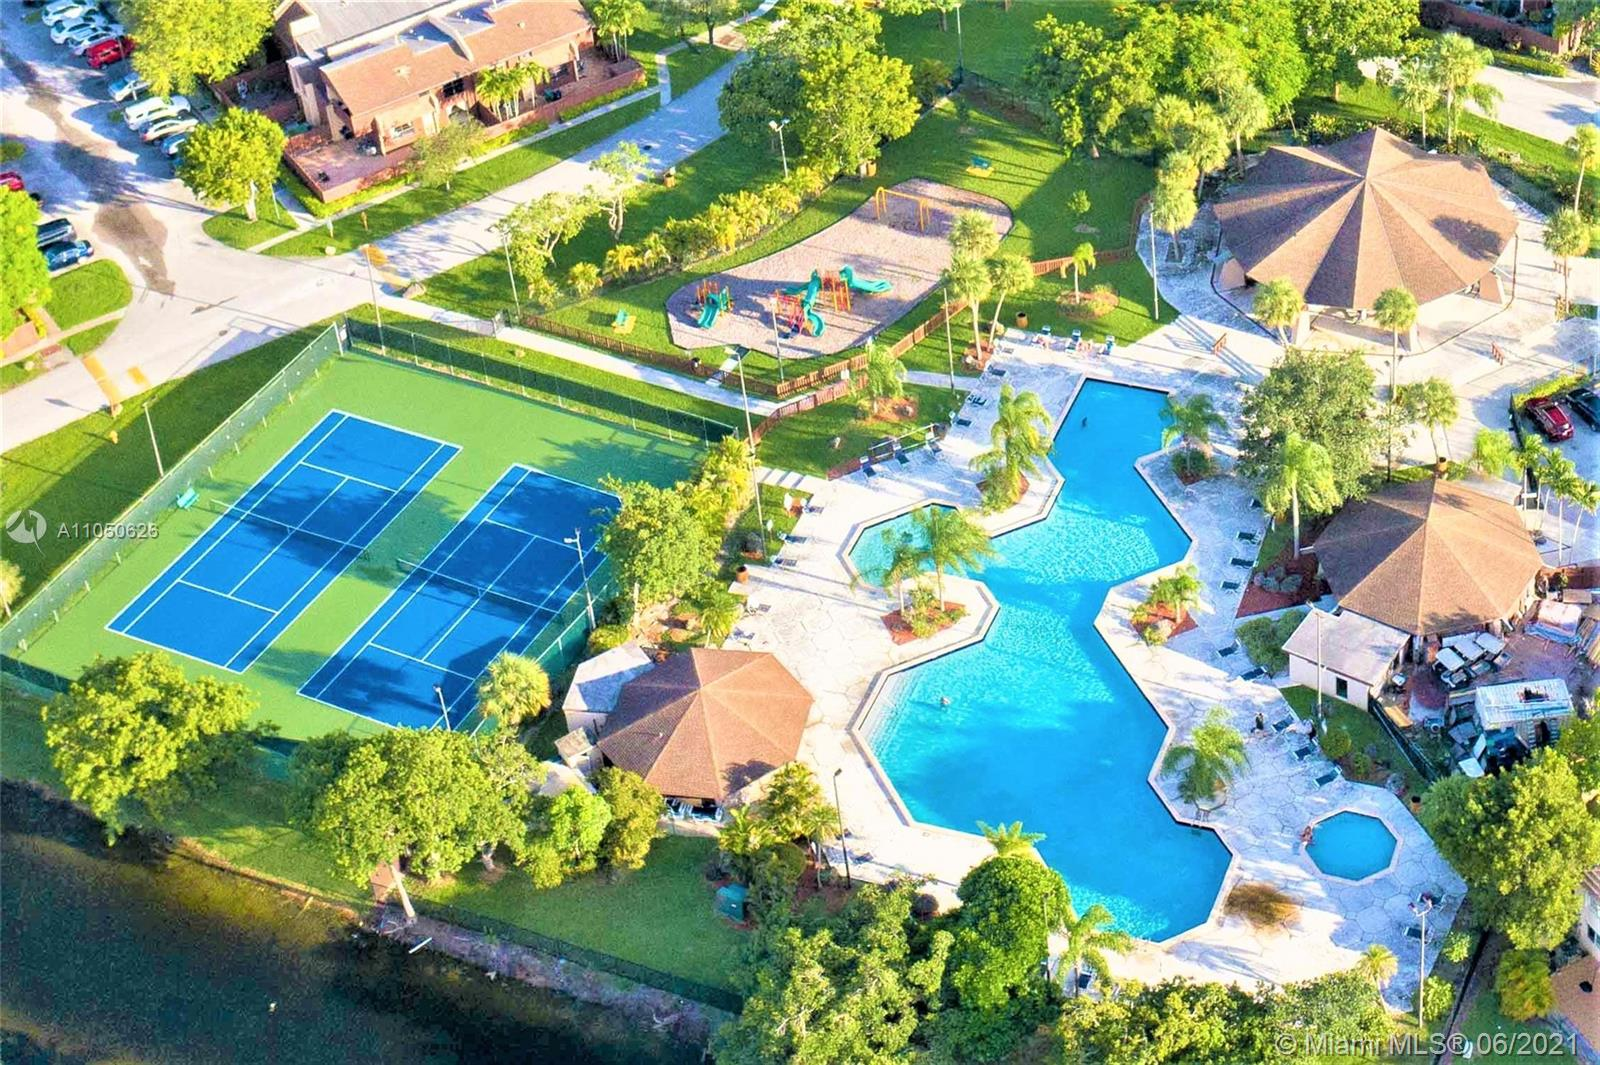 Snapper Creek #C - 6231 SW 116th Pl #C, Miami, FL 33173